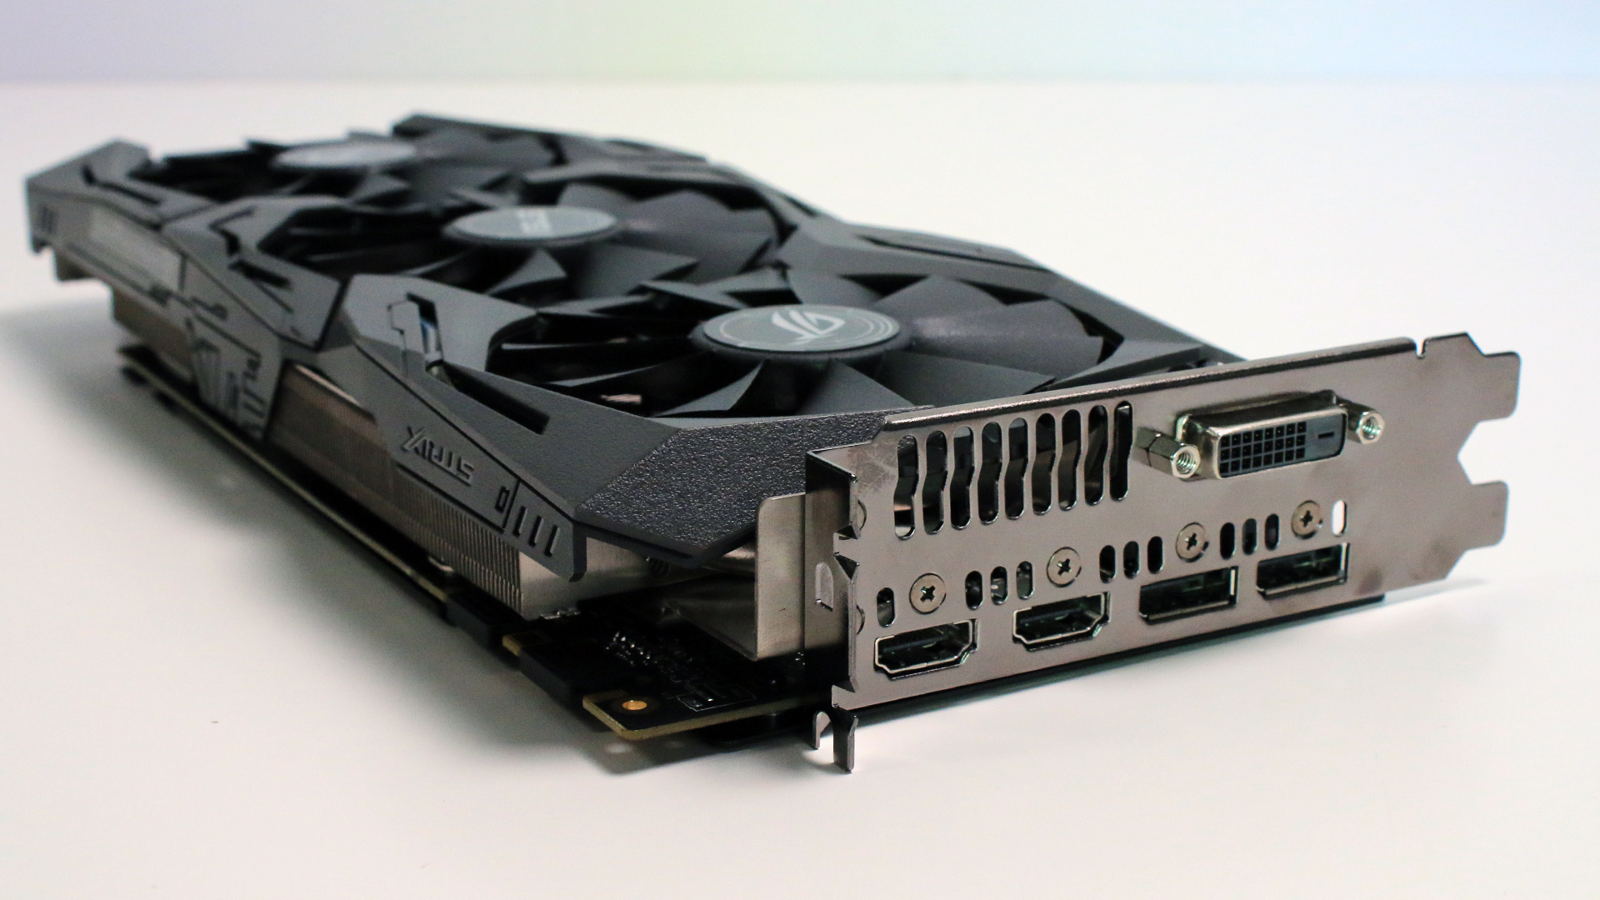 Nvidia Geforce Gtx 1080 Strix (Hardware) Review 3